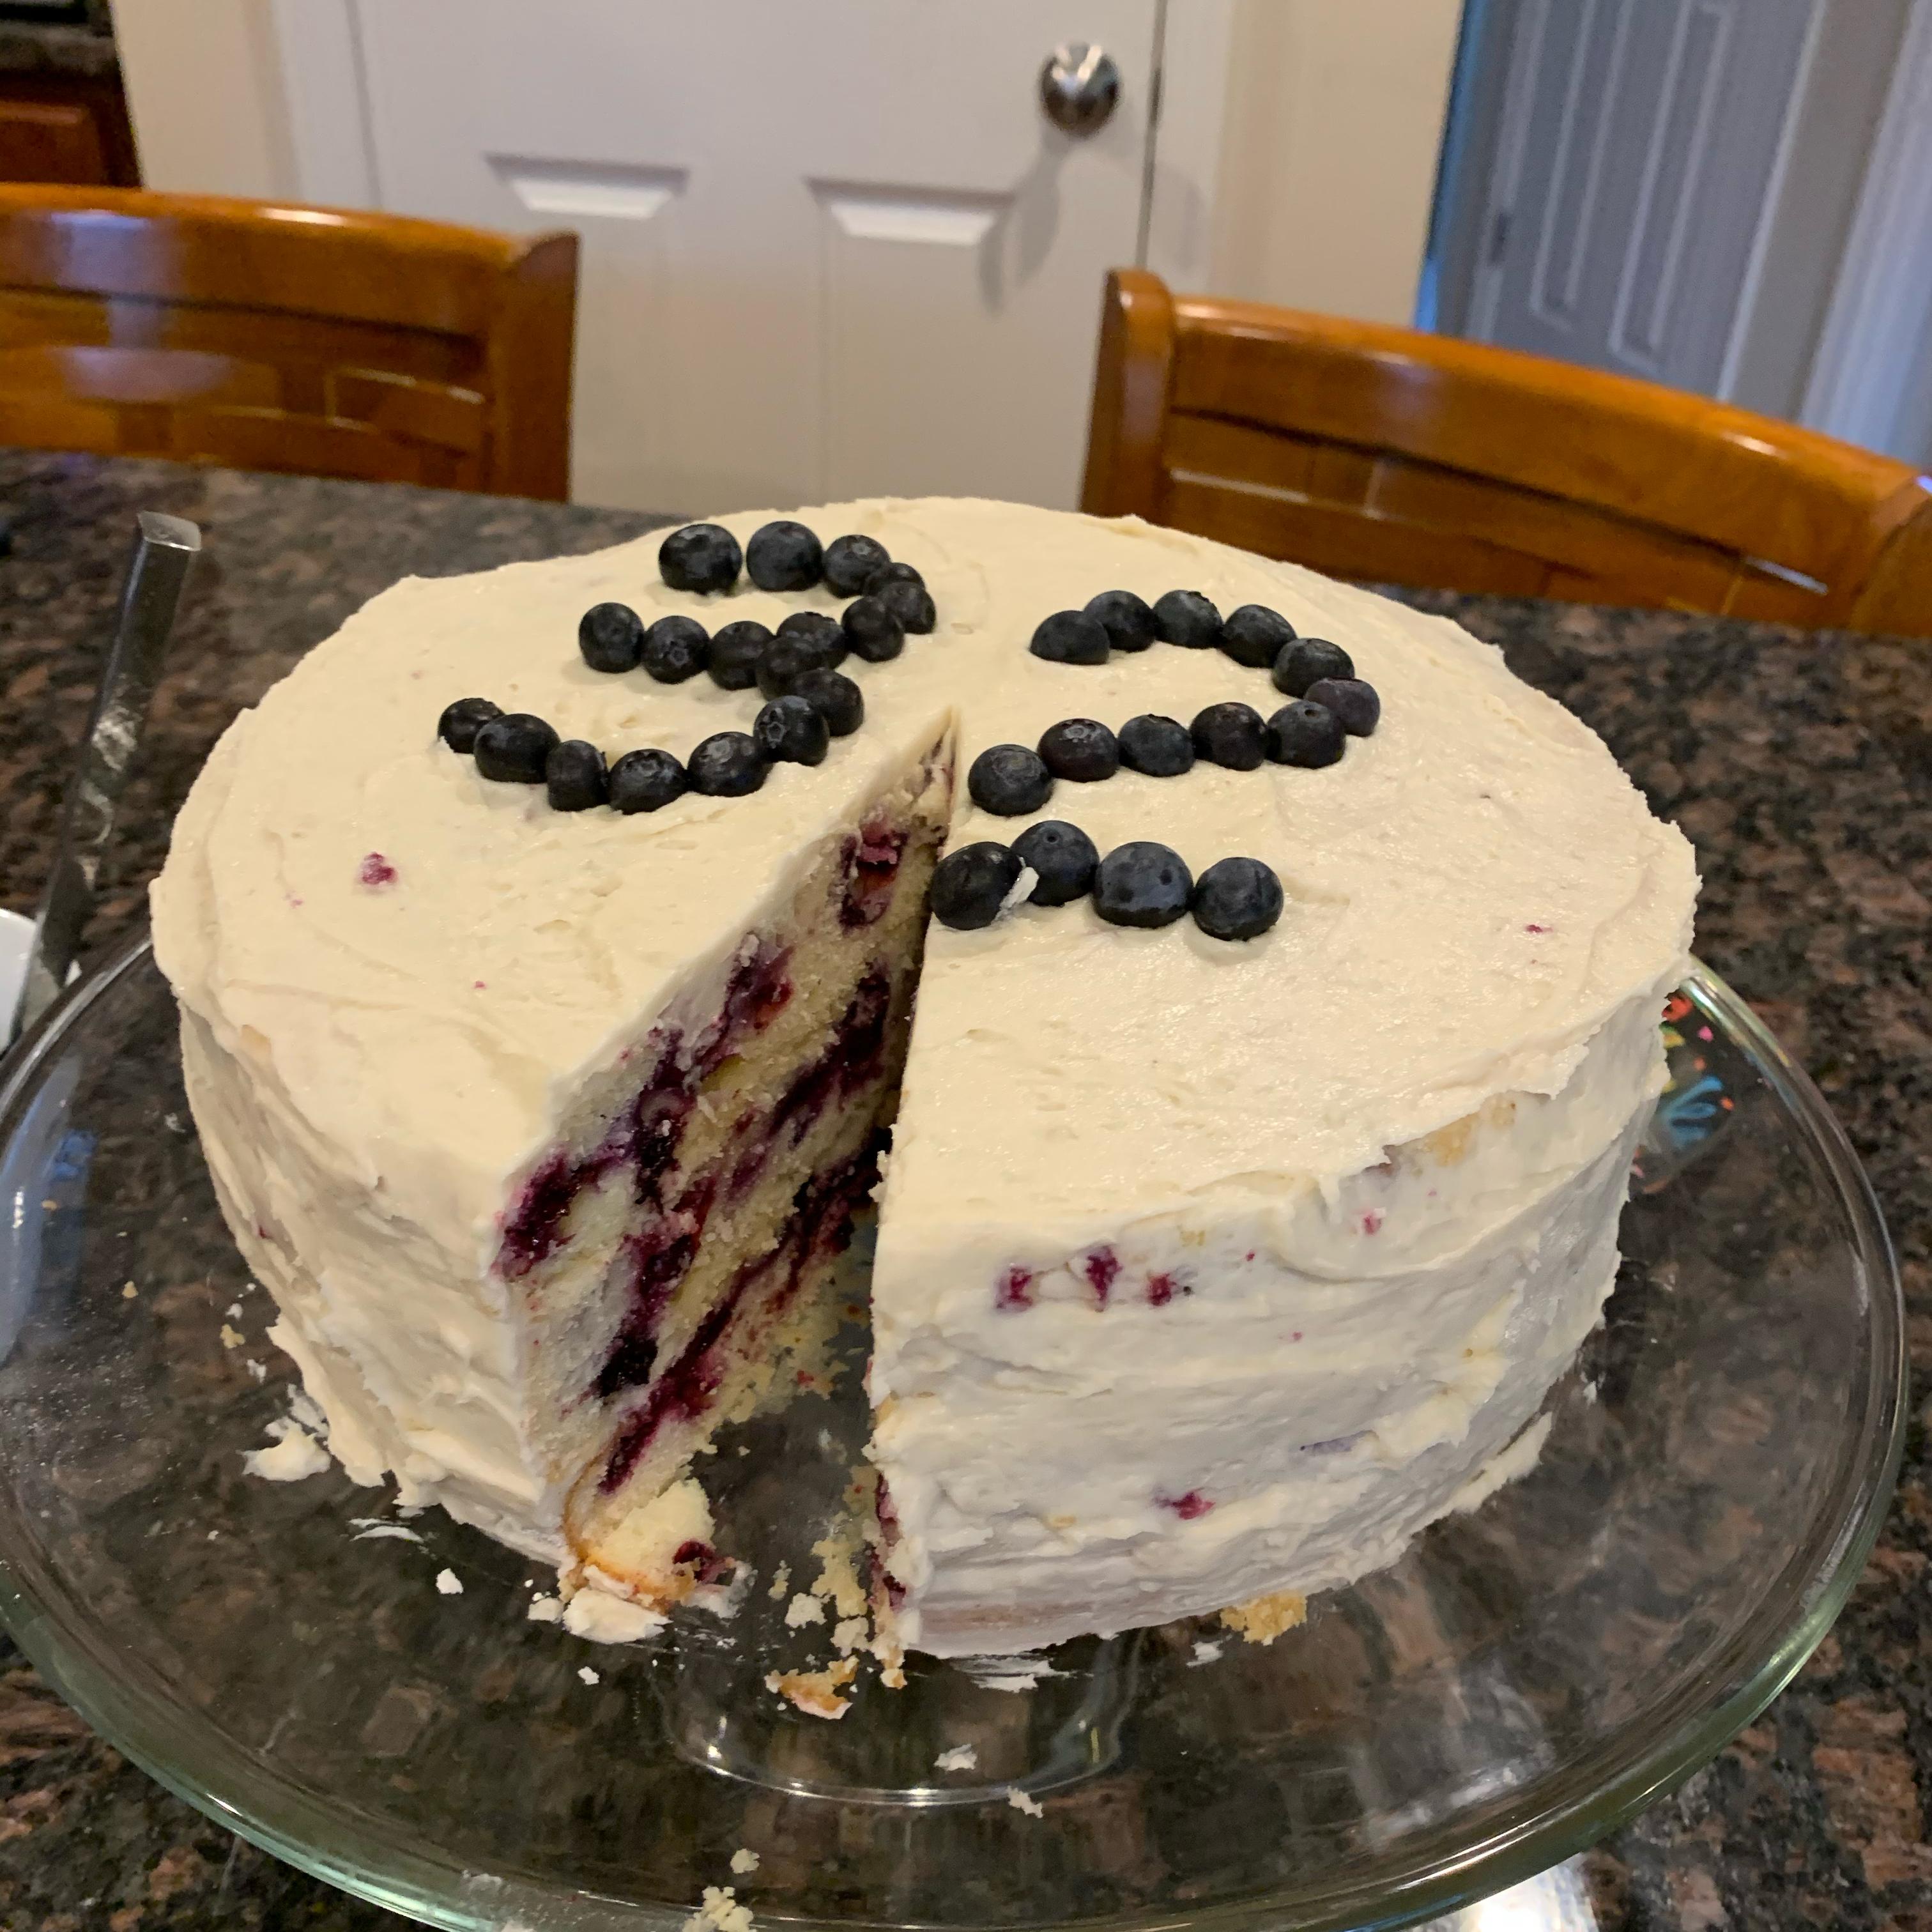 Blueberry Lemon Cake with Buttercream Frosting